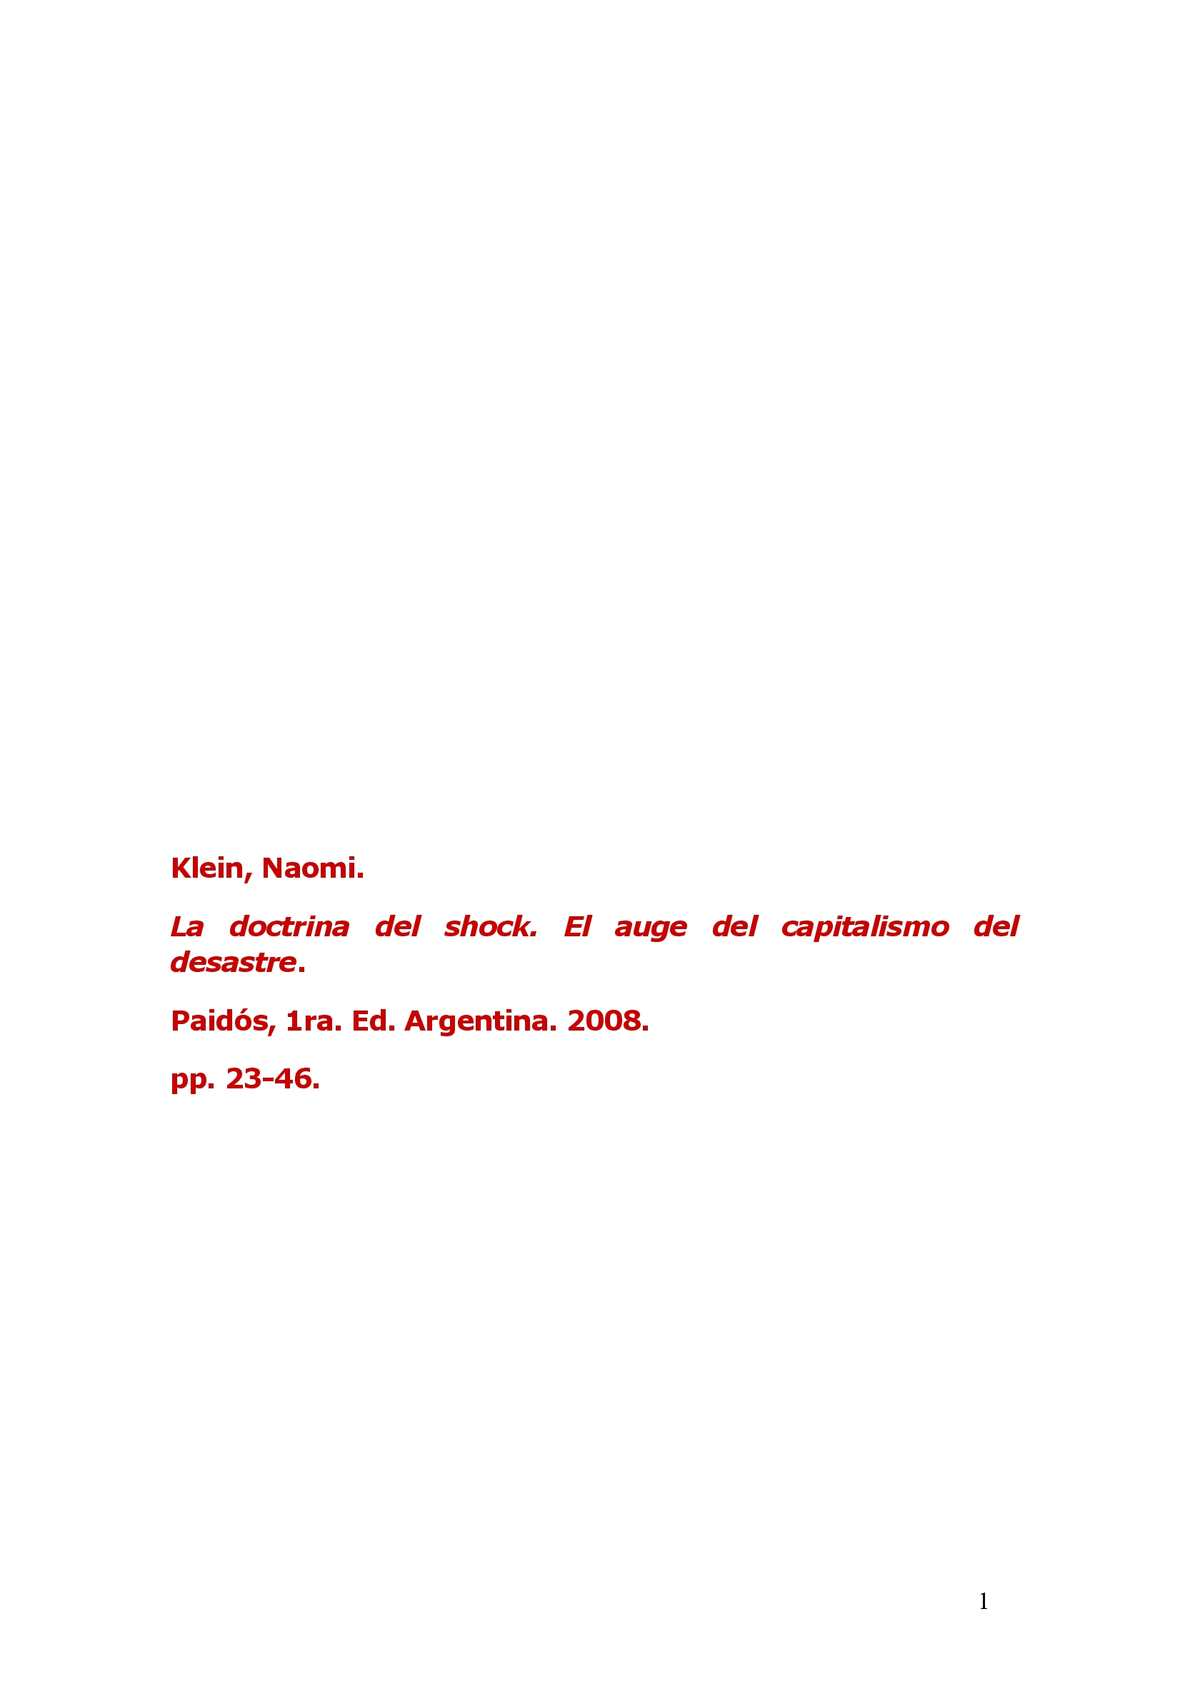 Calaméo - Naomi Klein: La doctrina del shock - obra completa